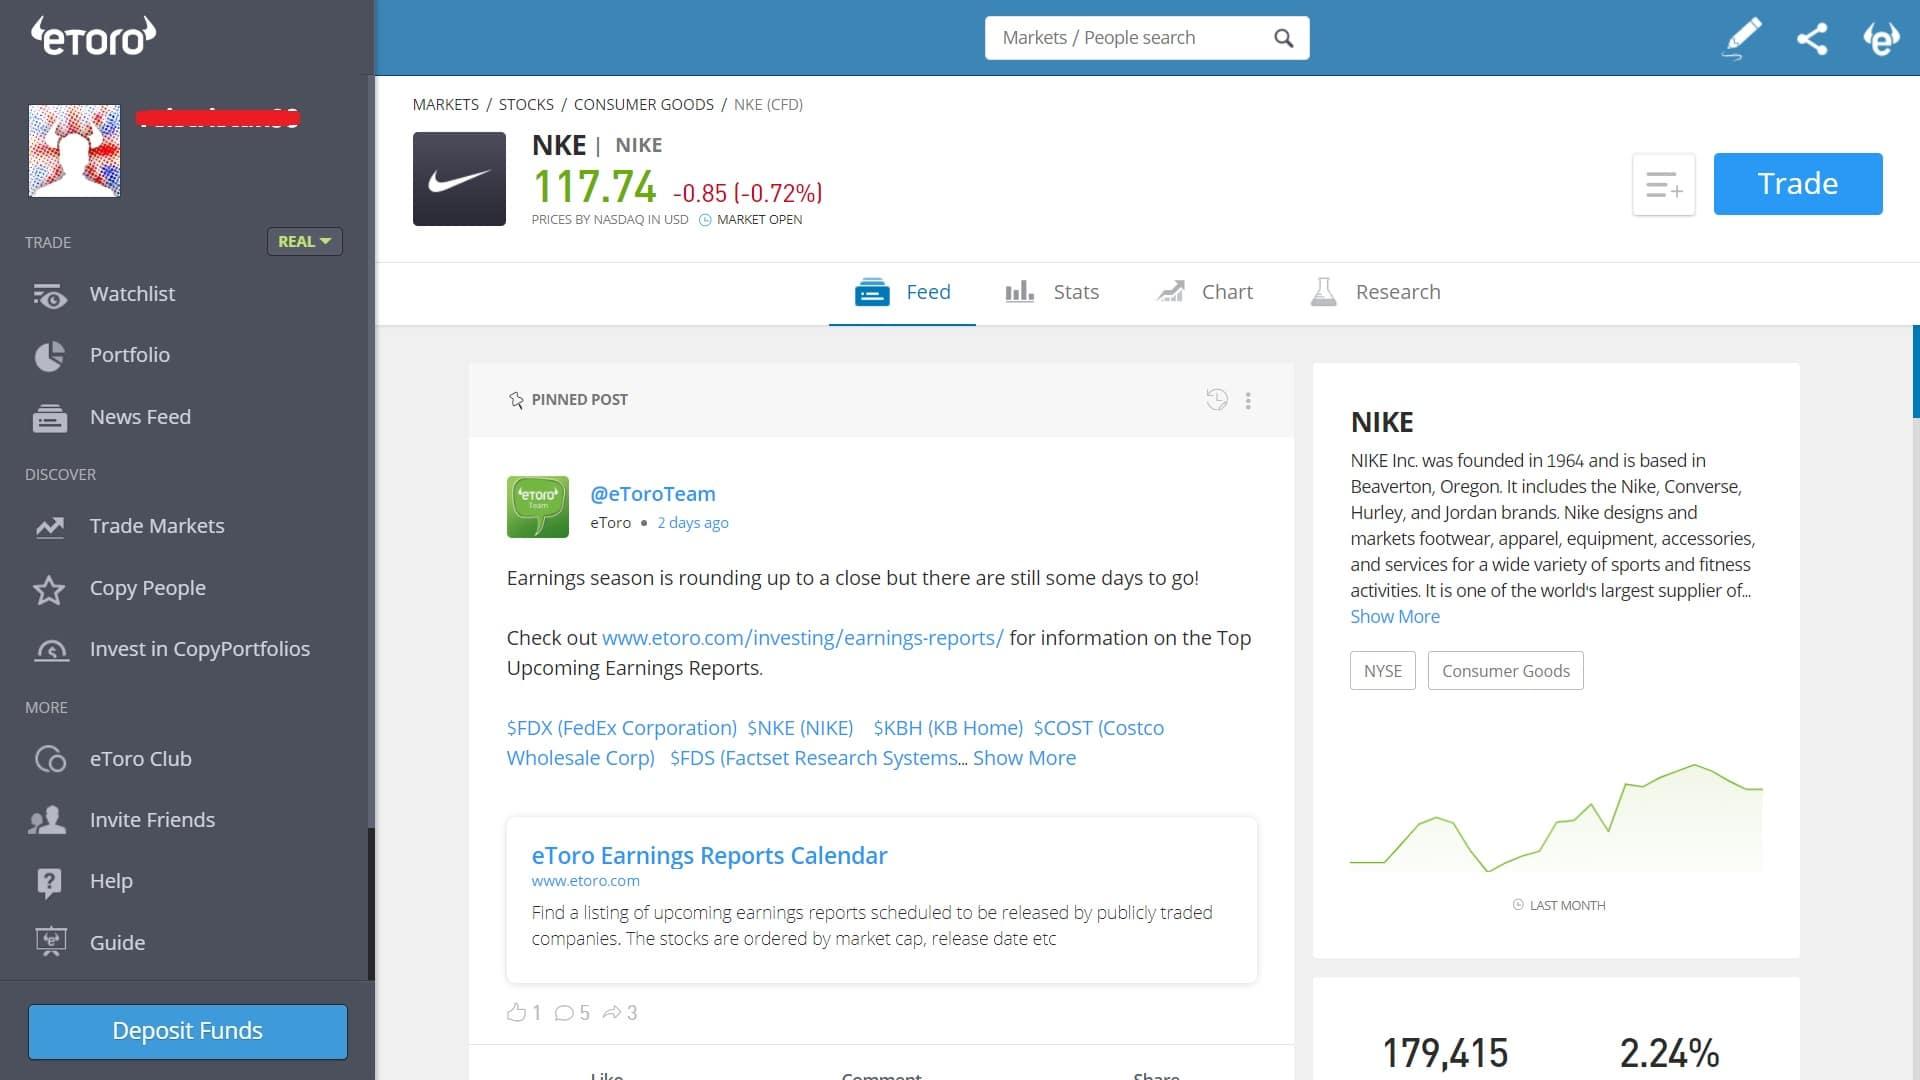 Nike stock trading on eToro's platform